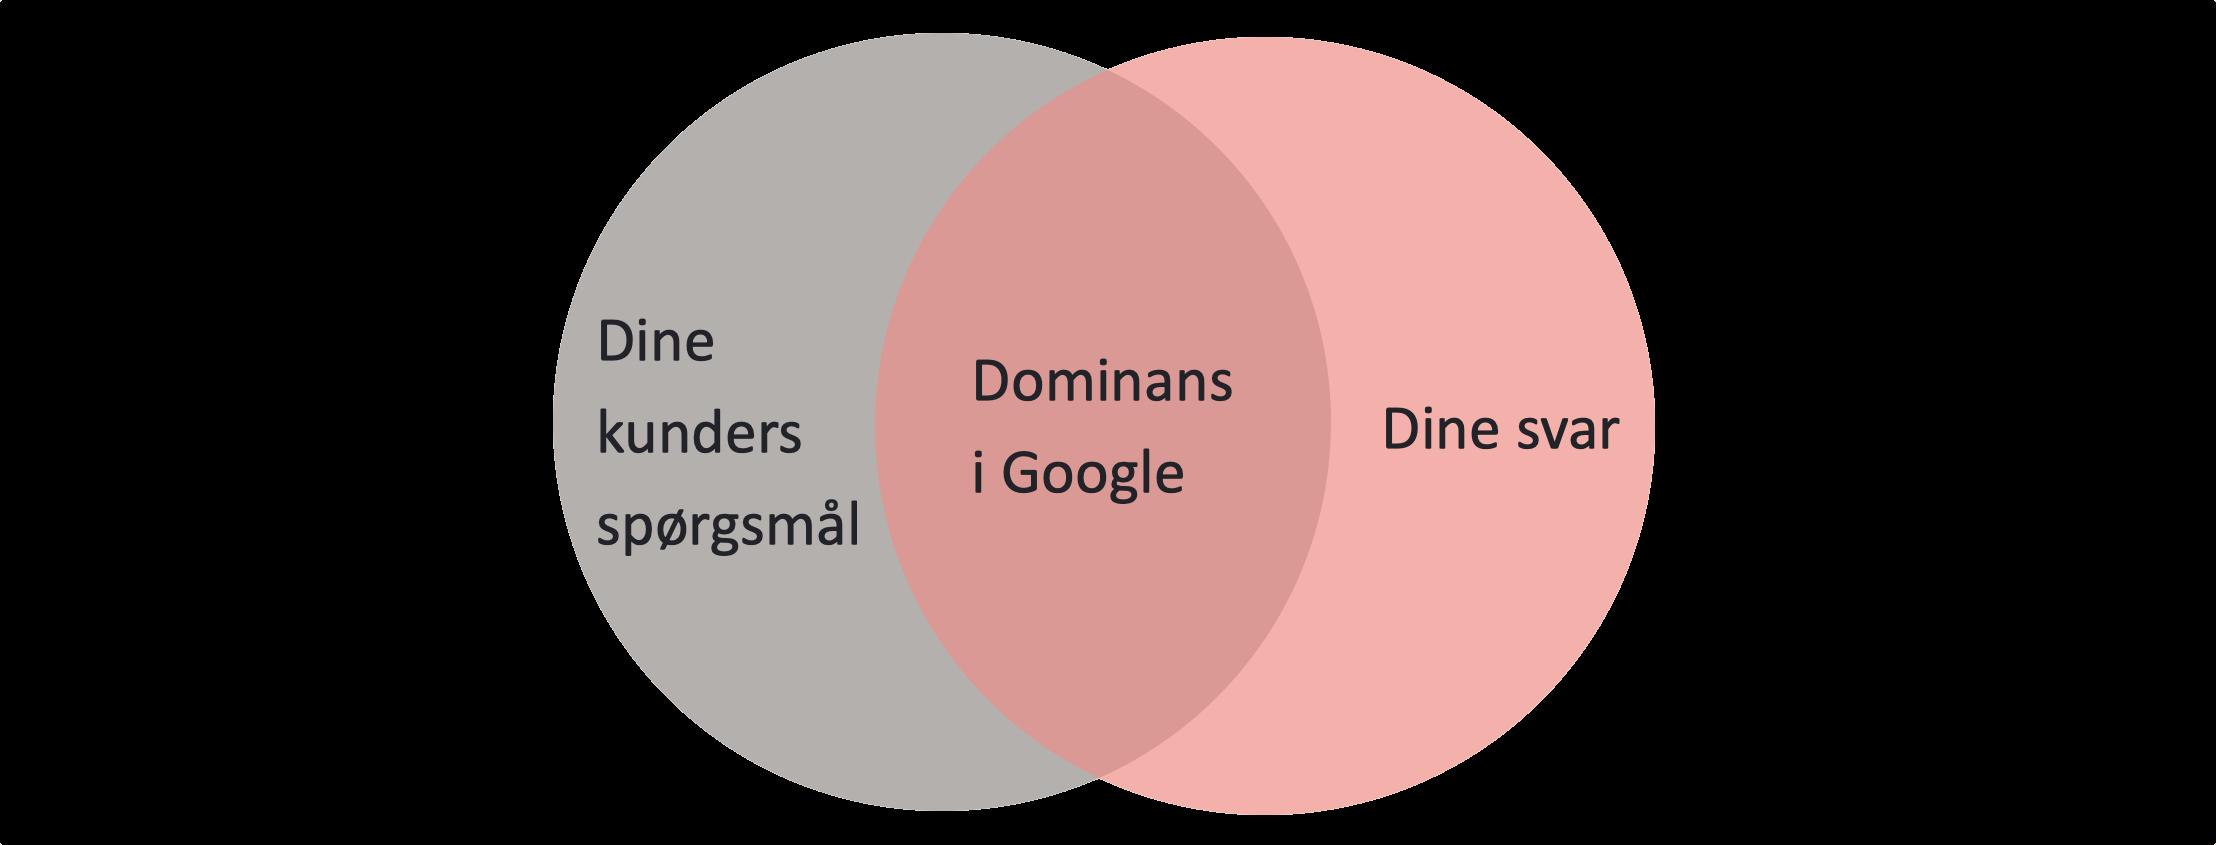 dominans i google